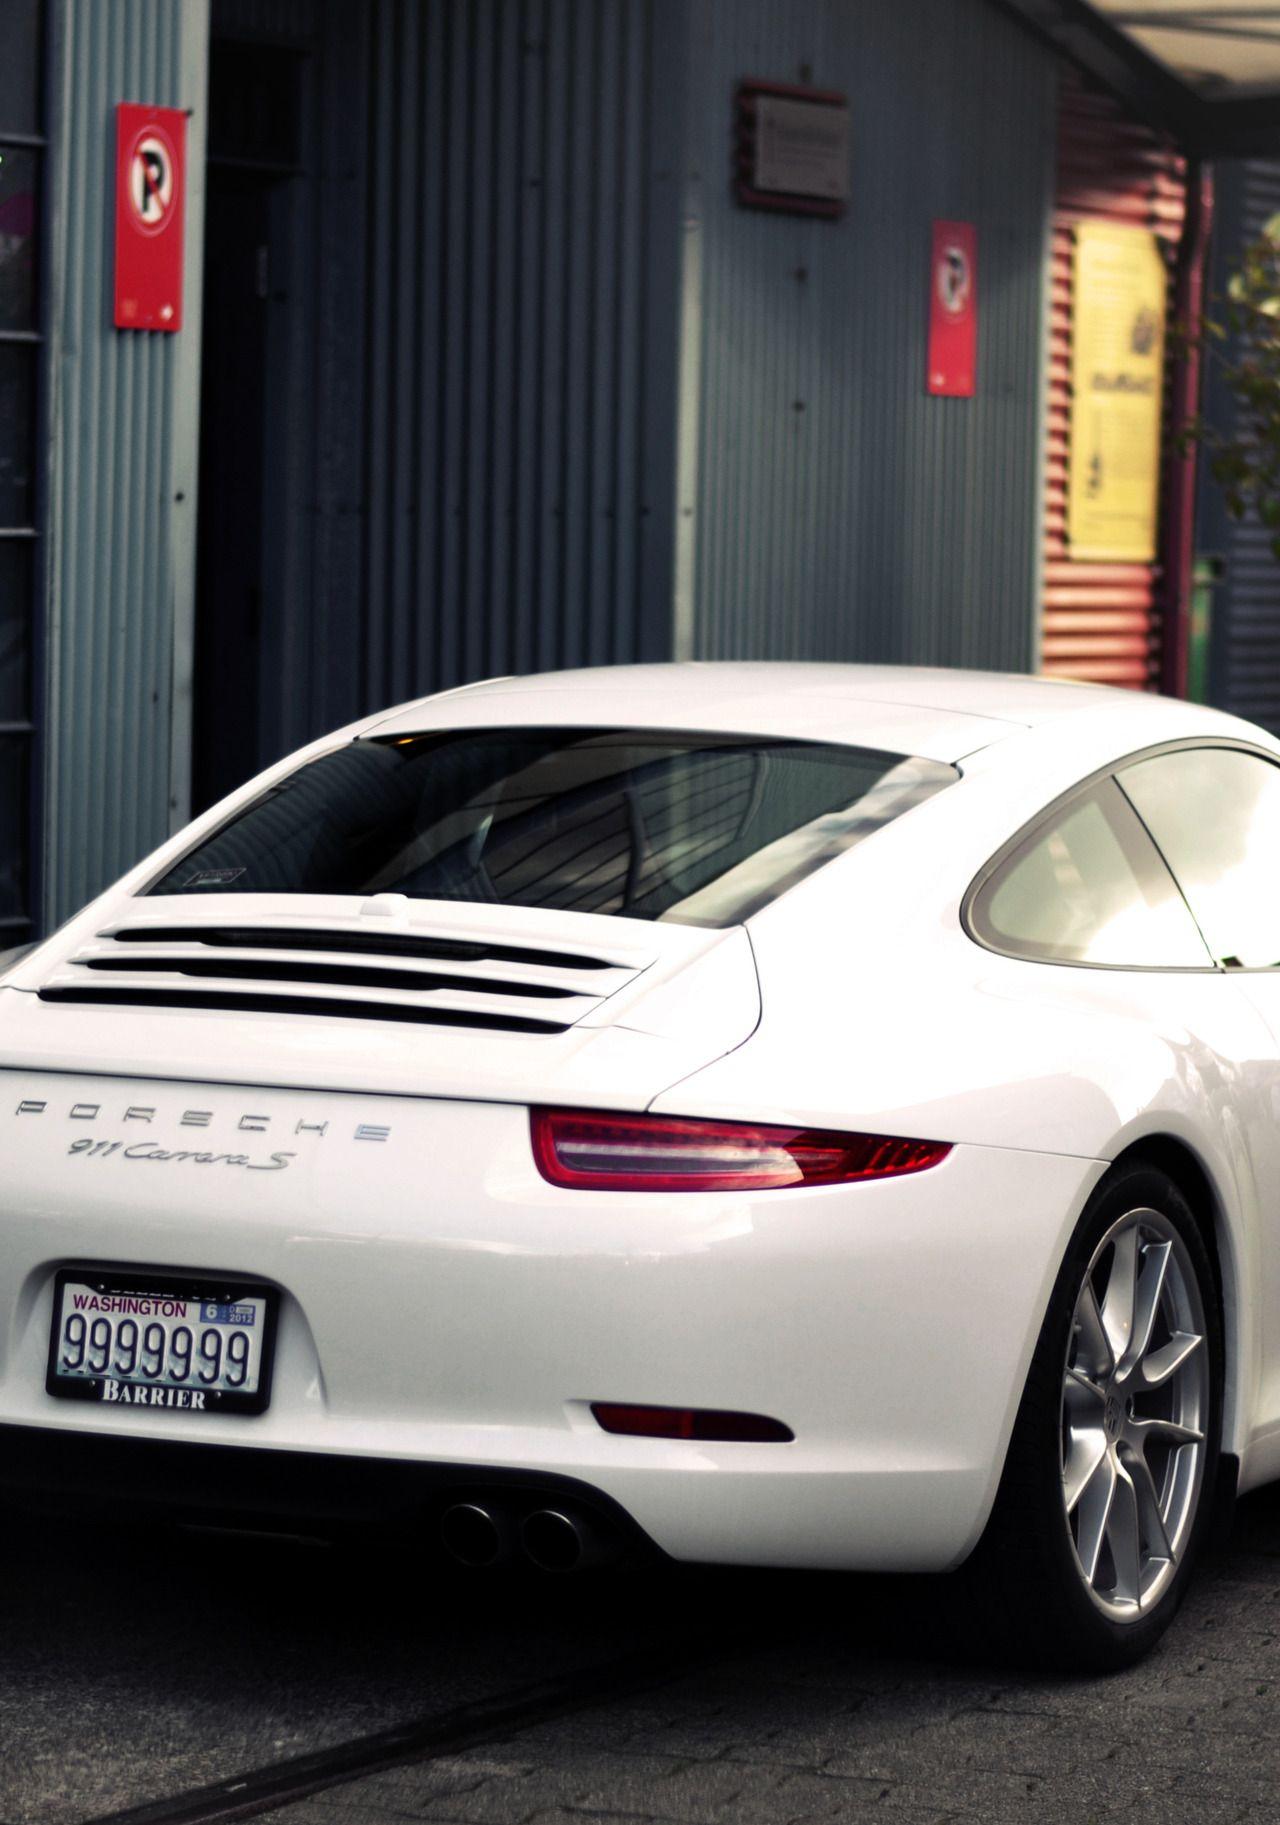 Porsche 911 Carrera S      911 Carrera S // DK. Photography                      Dat license plate